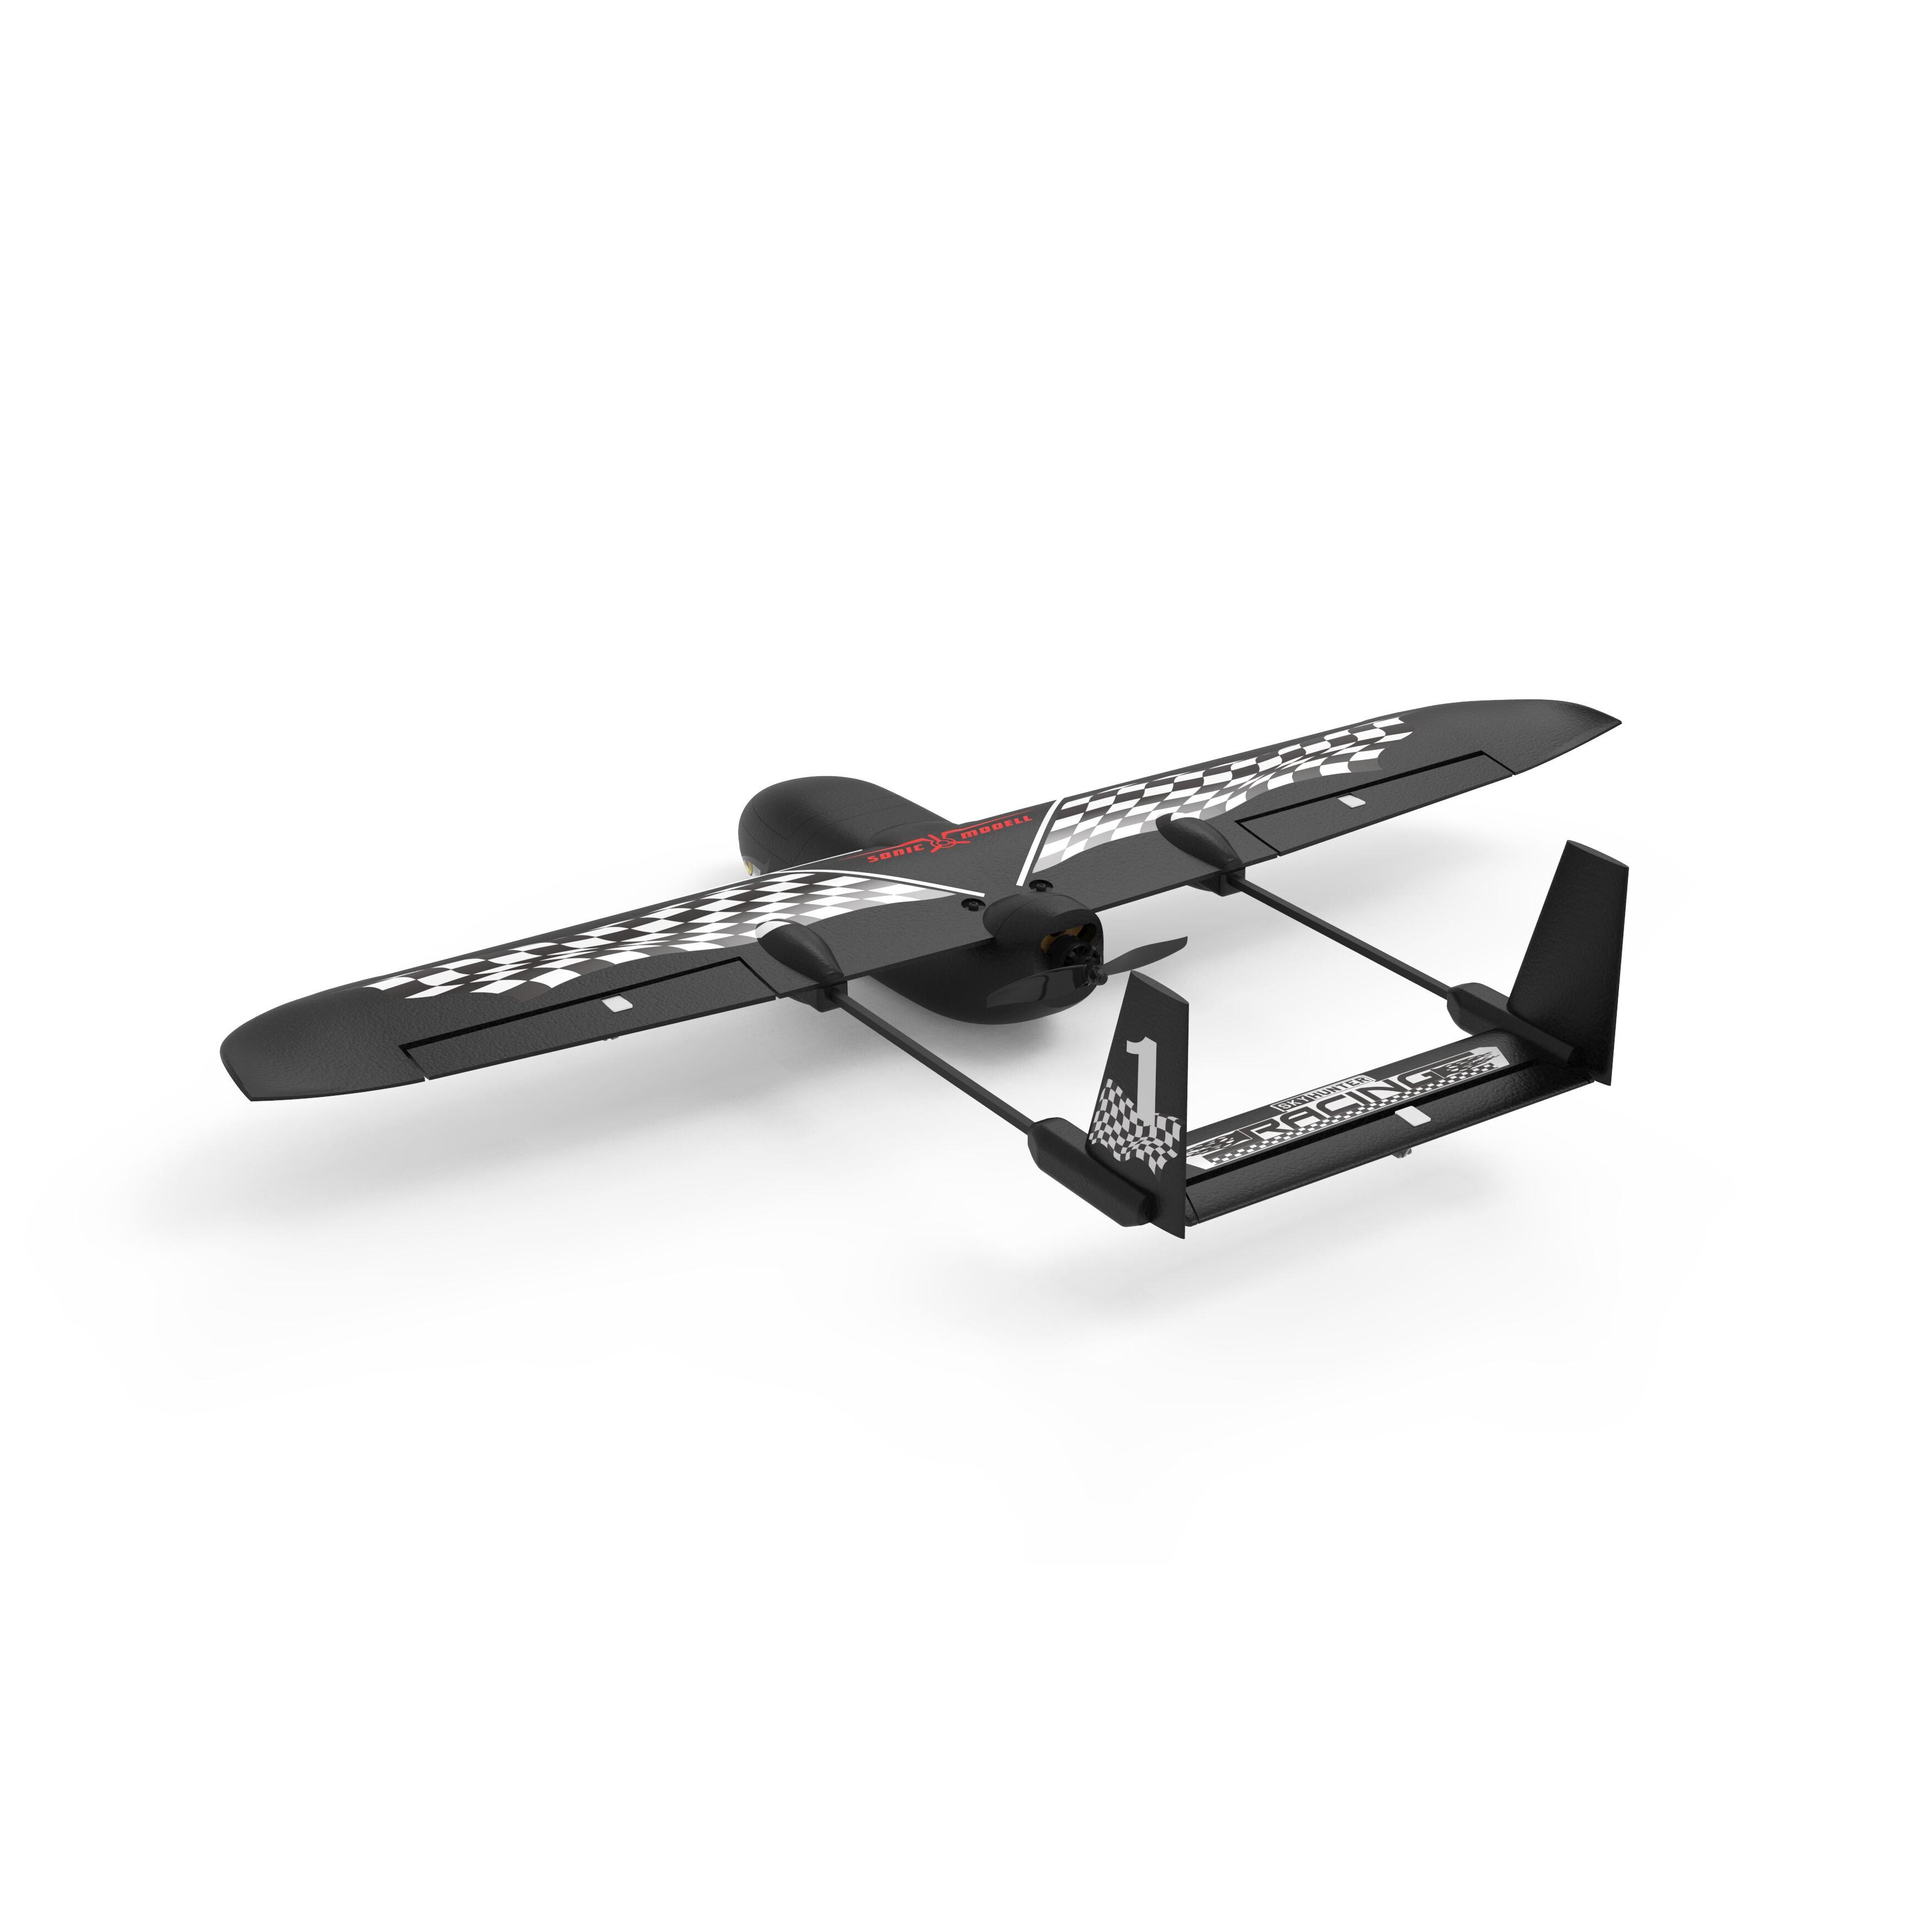 Sonicmodell Skyhunter Racing 787mm Wingspan EPP FPV Aircraft RC Airplane Racer KIT - Photo: 3